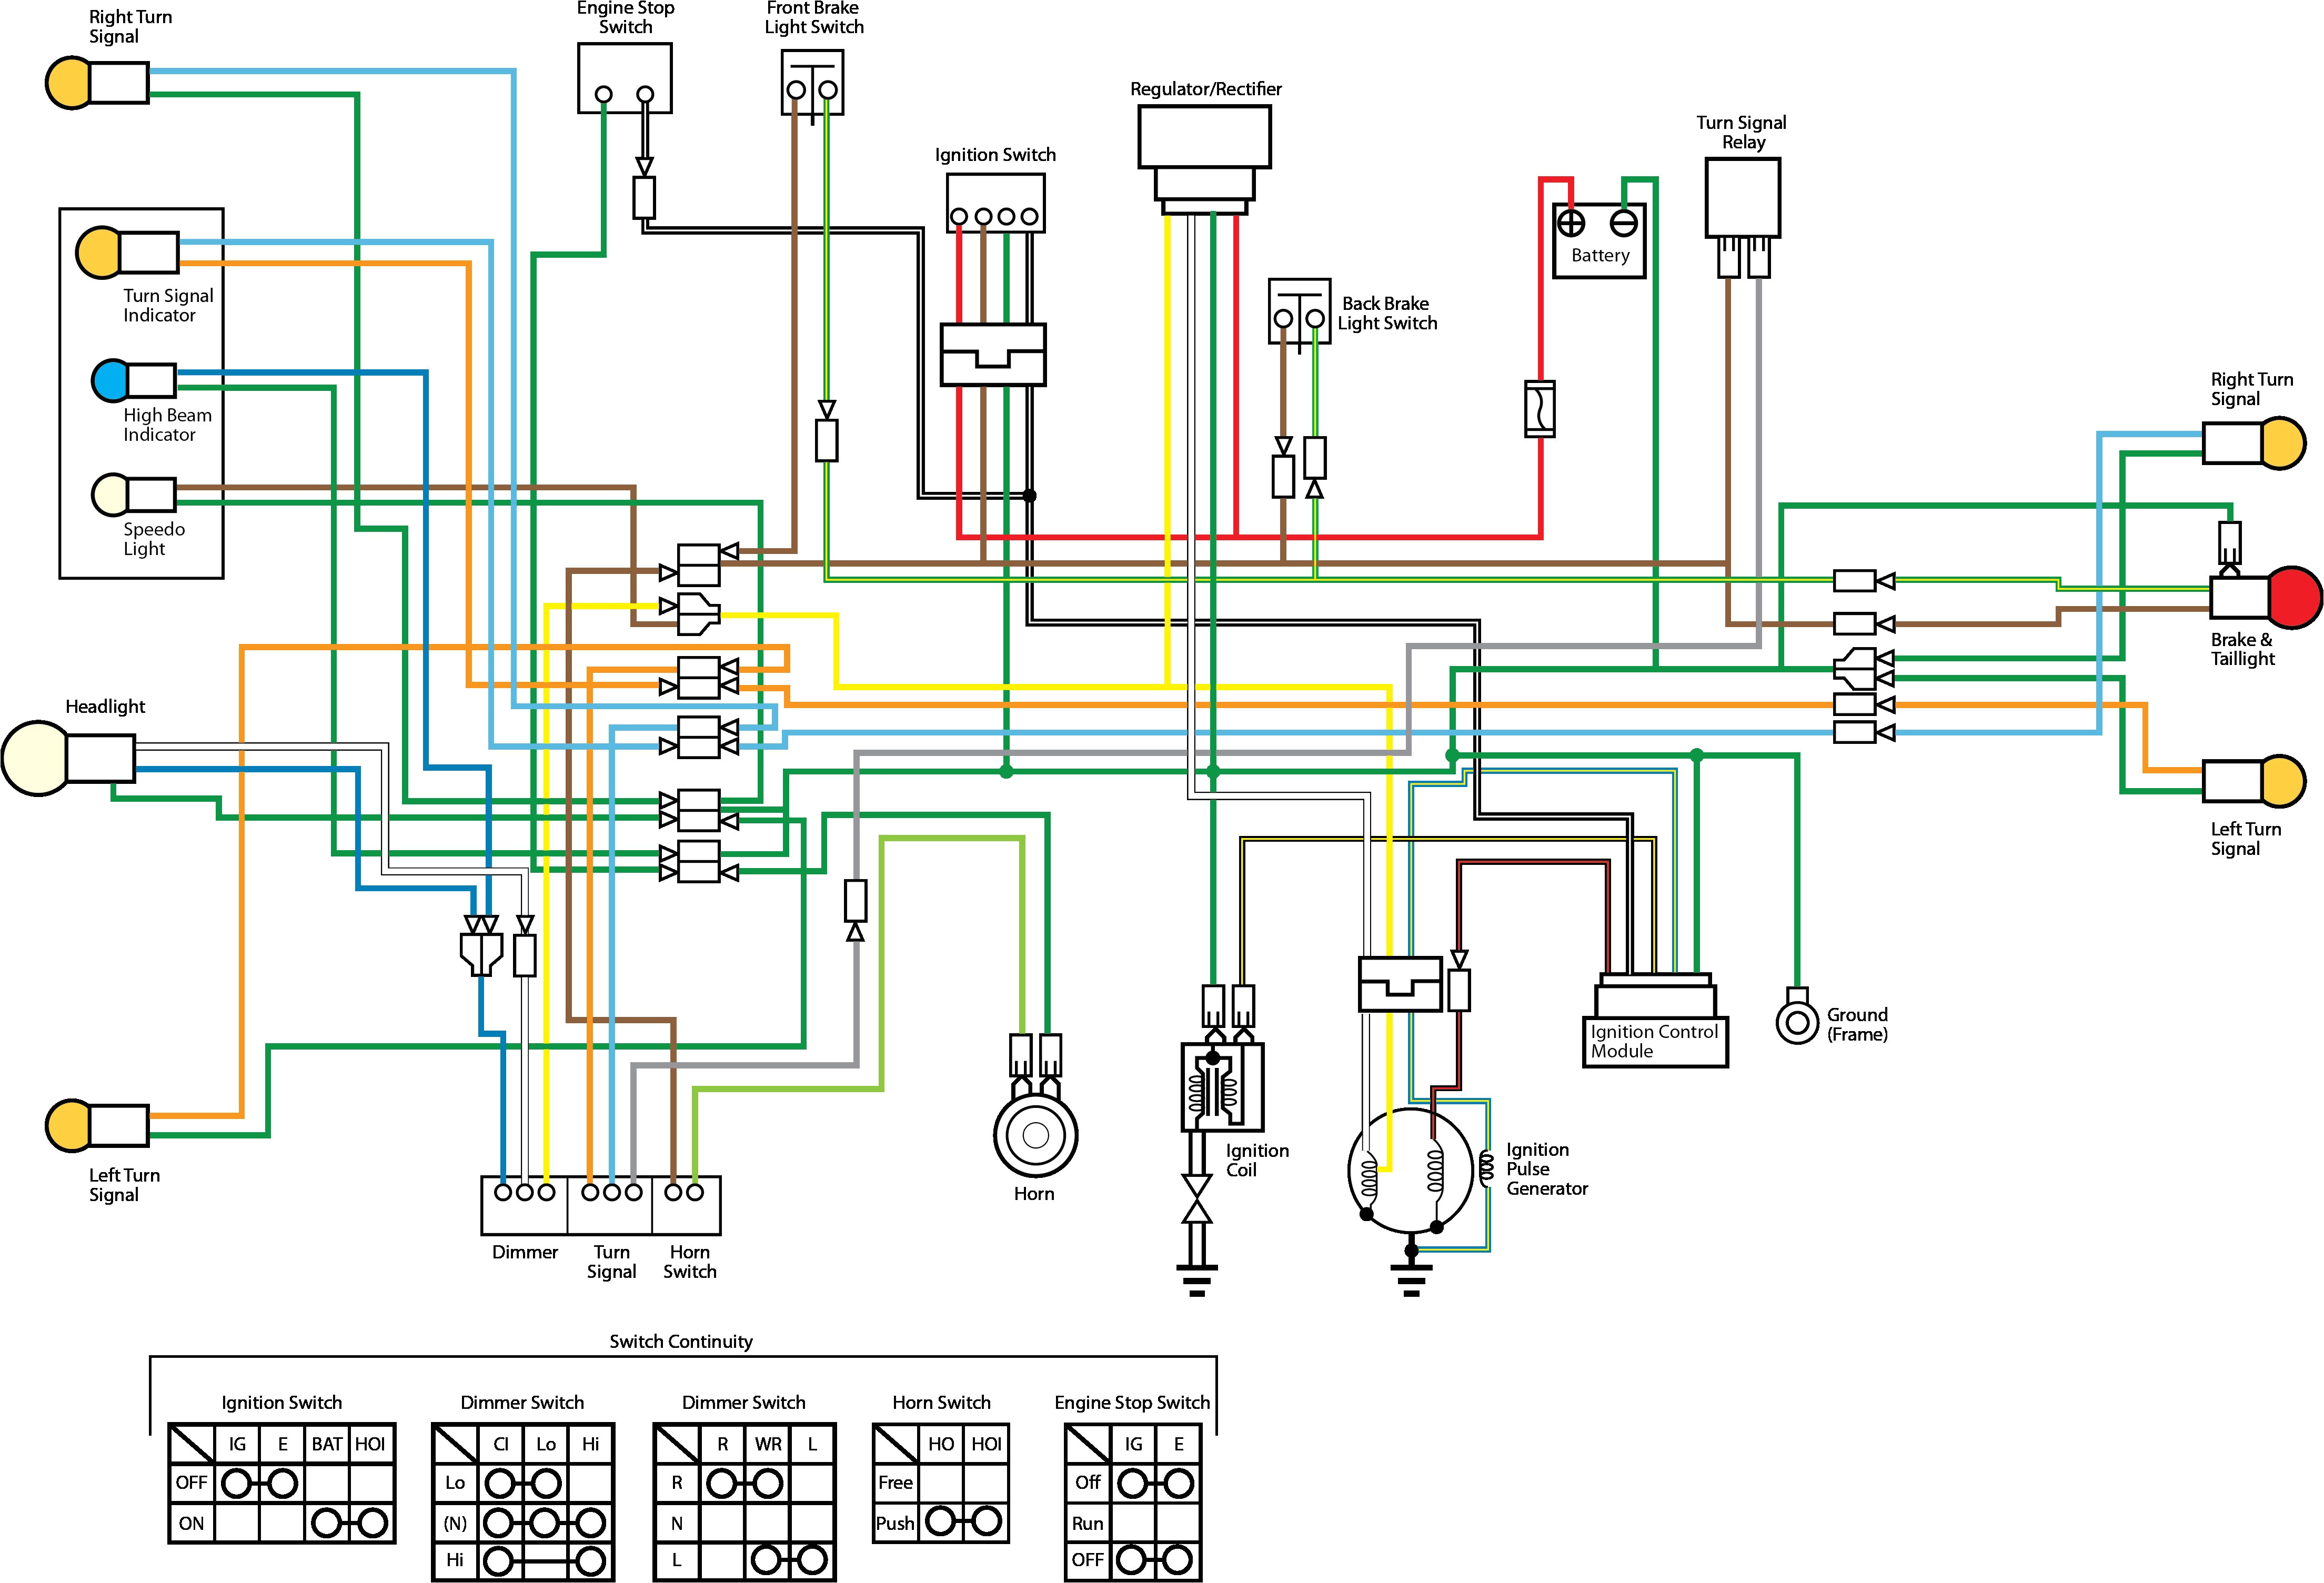 650sx wiring diagram